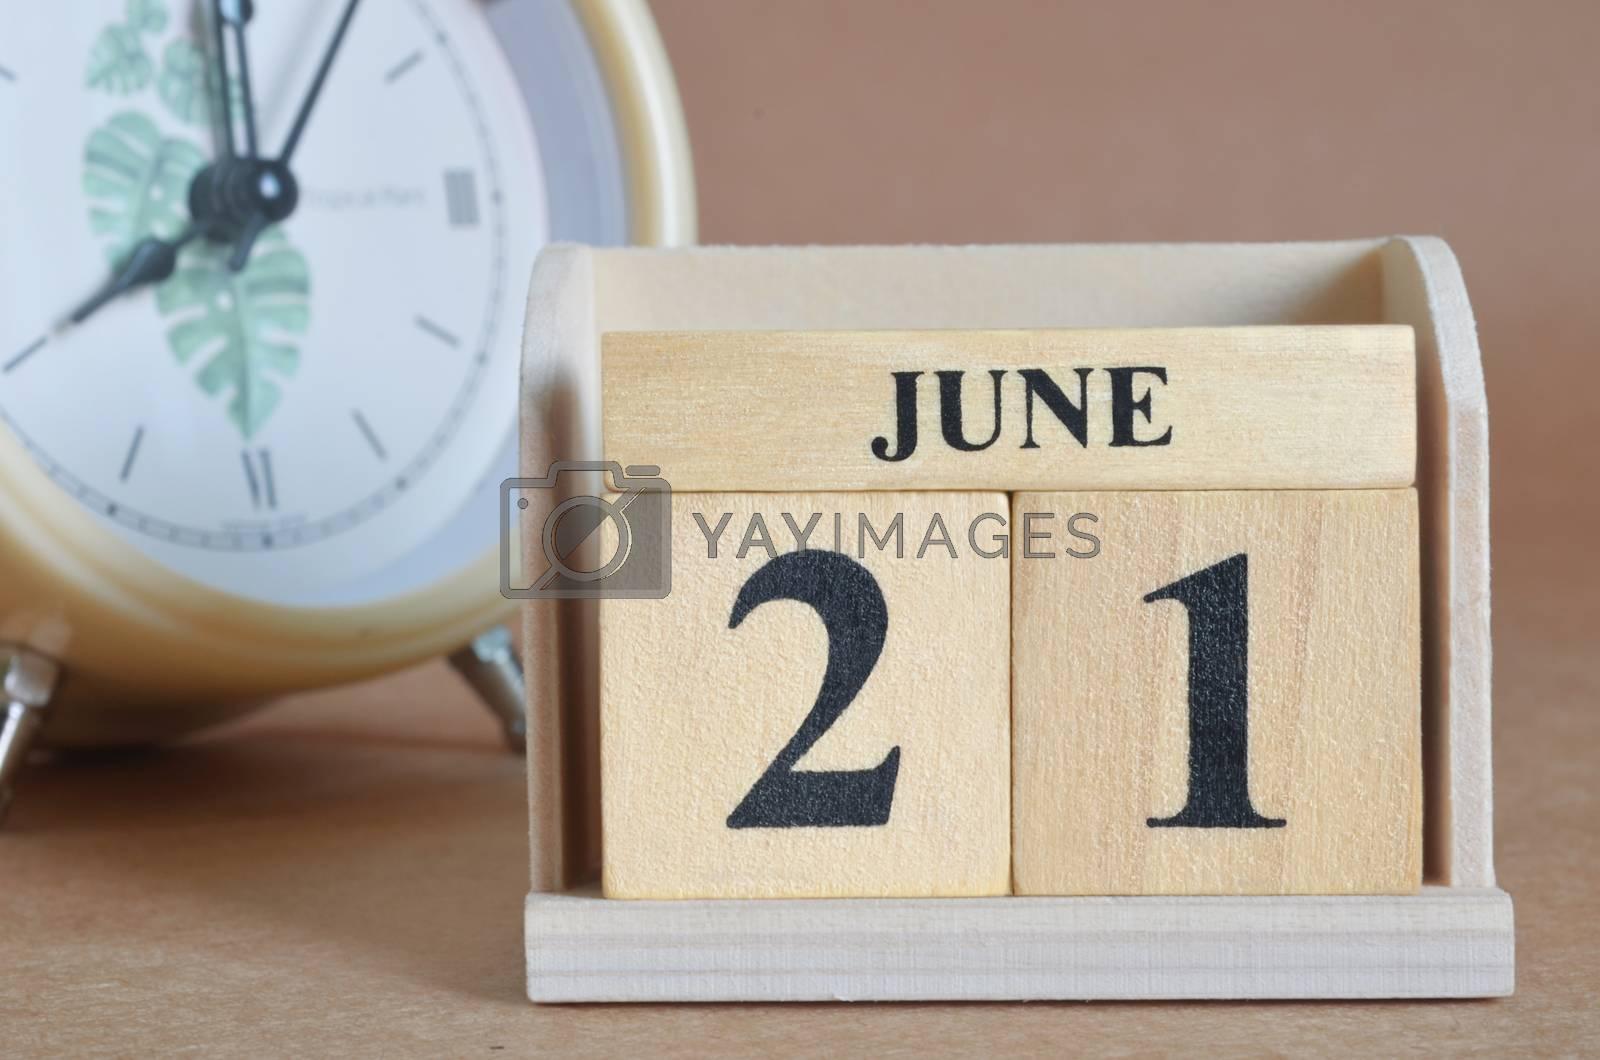 June 21 by Mrfrost